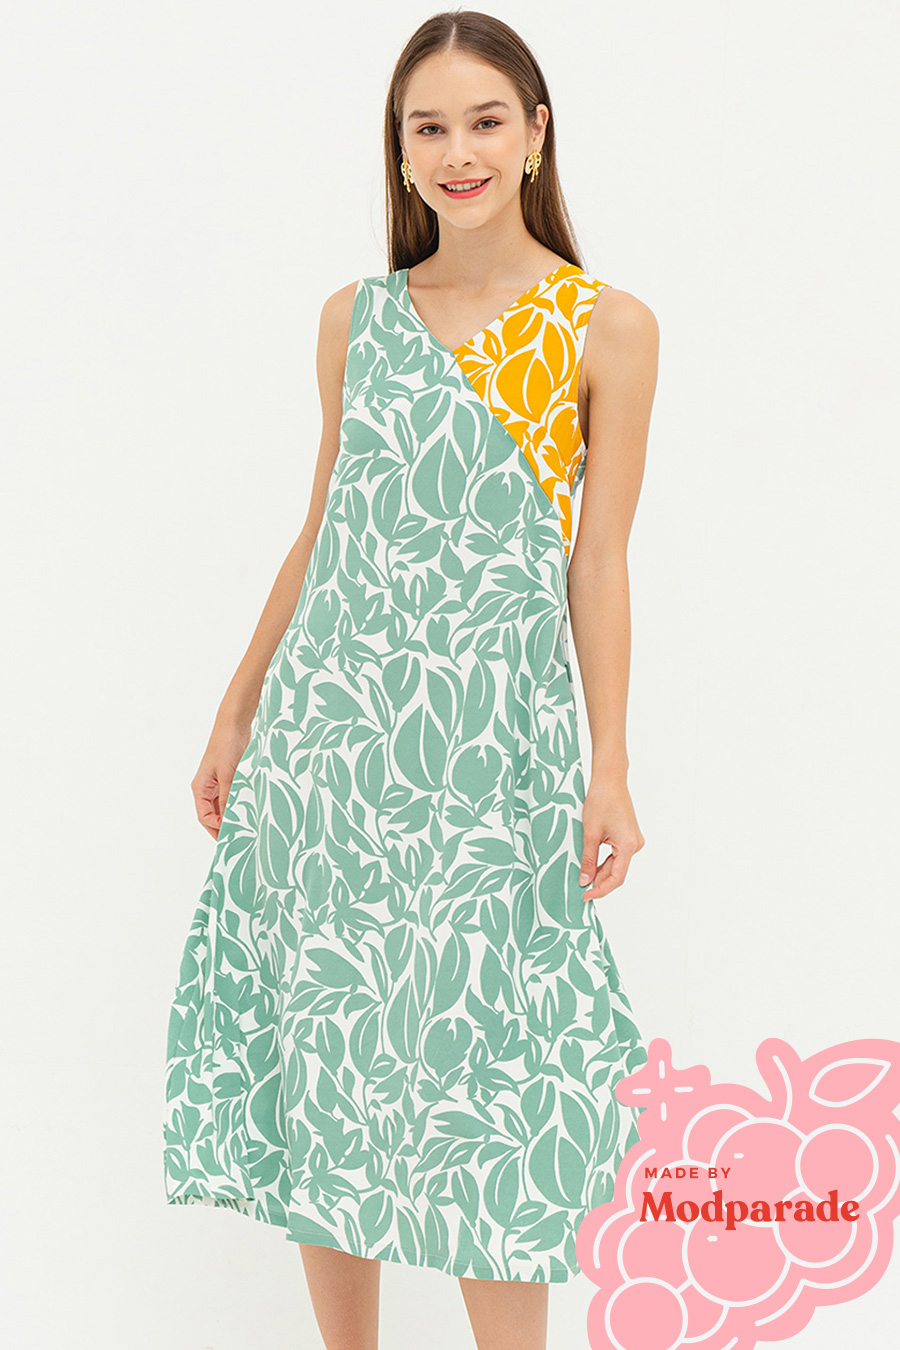 MIRIAM DRESS - TAMBARA [BY MODPARADE]